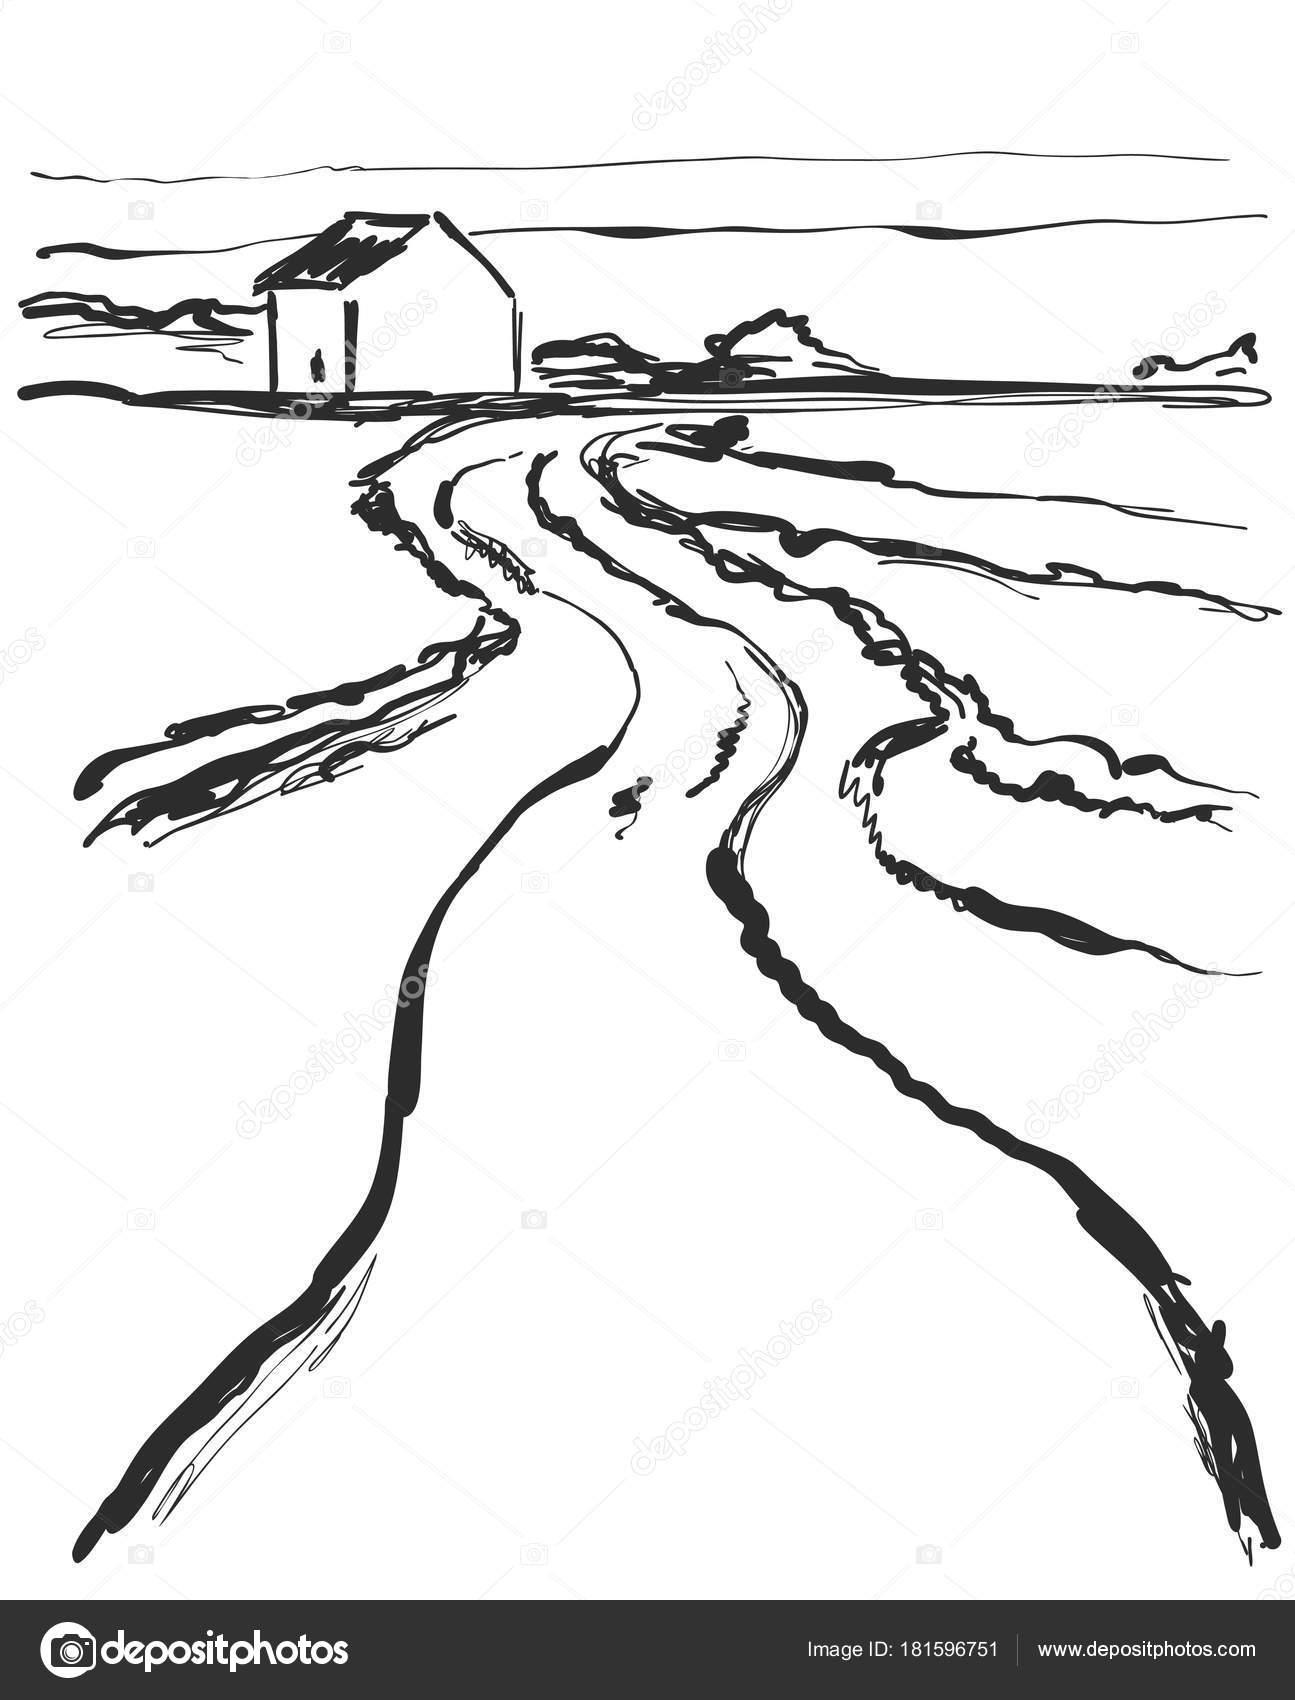 Imagenes Camino Dibujo